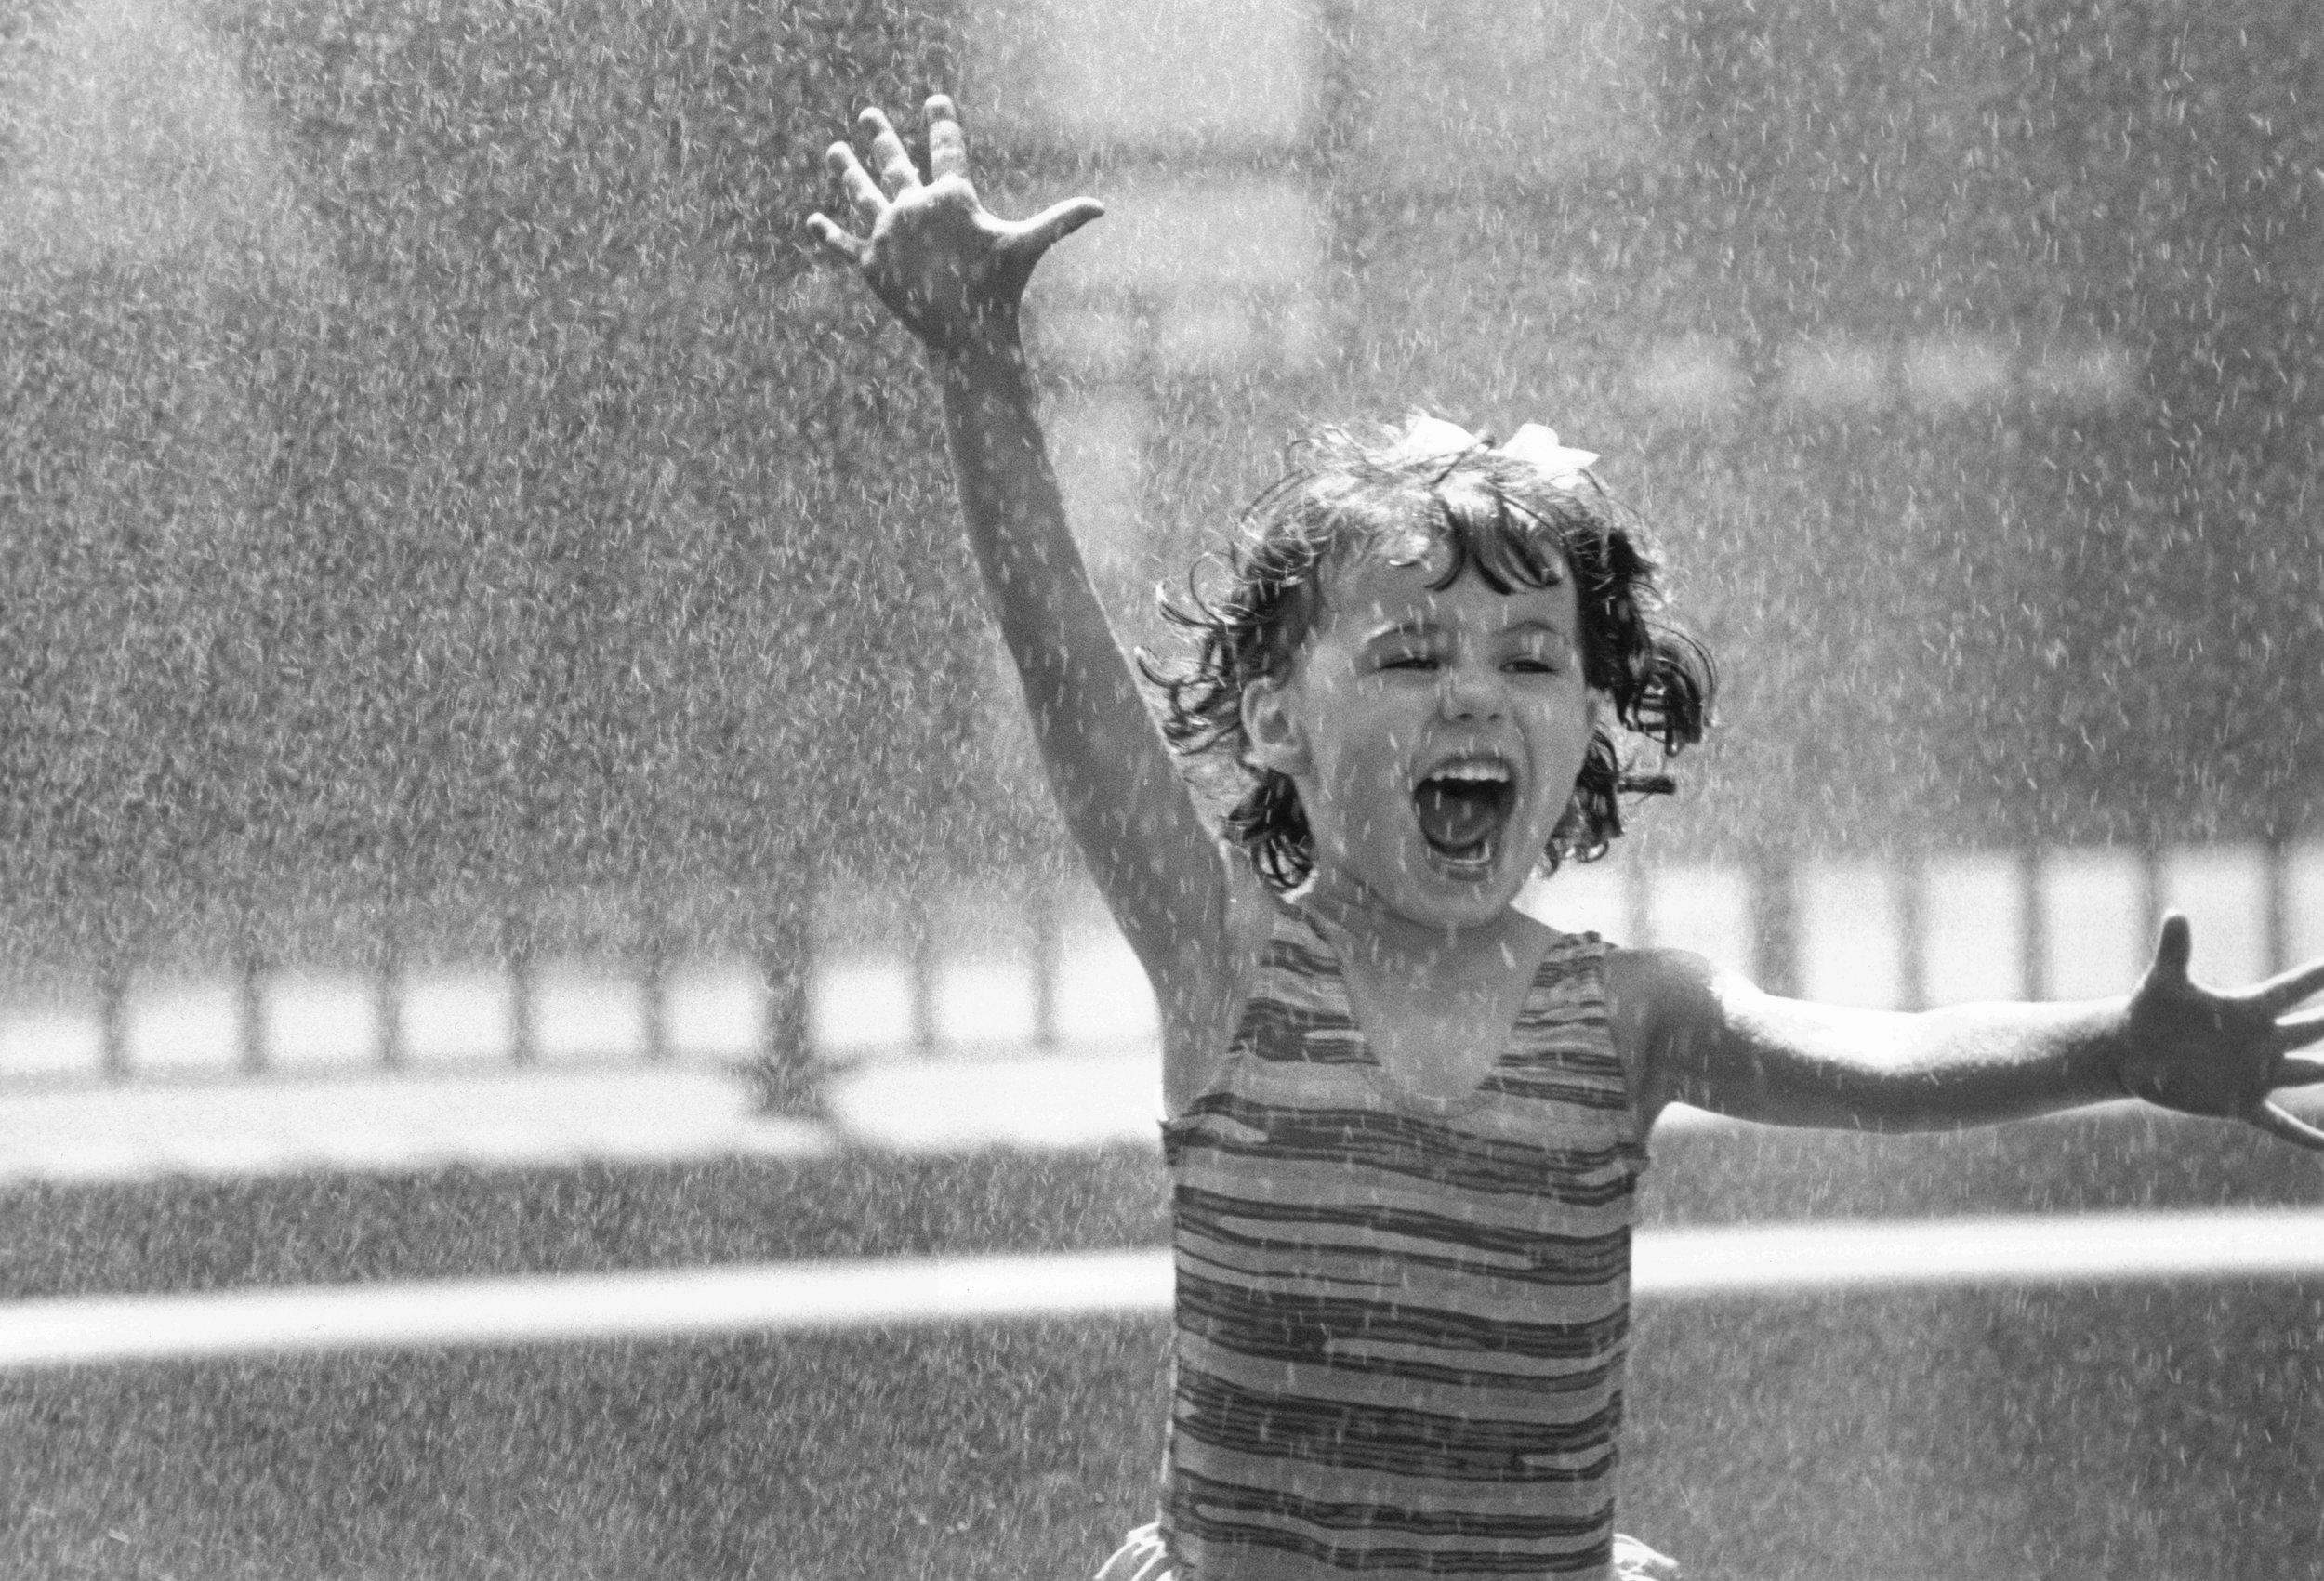 Girl going through water splash.jpg